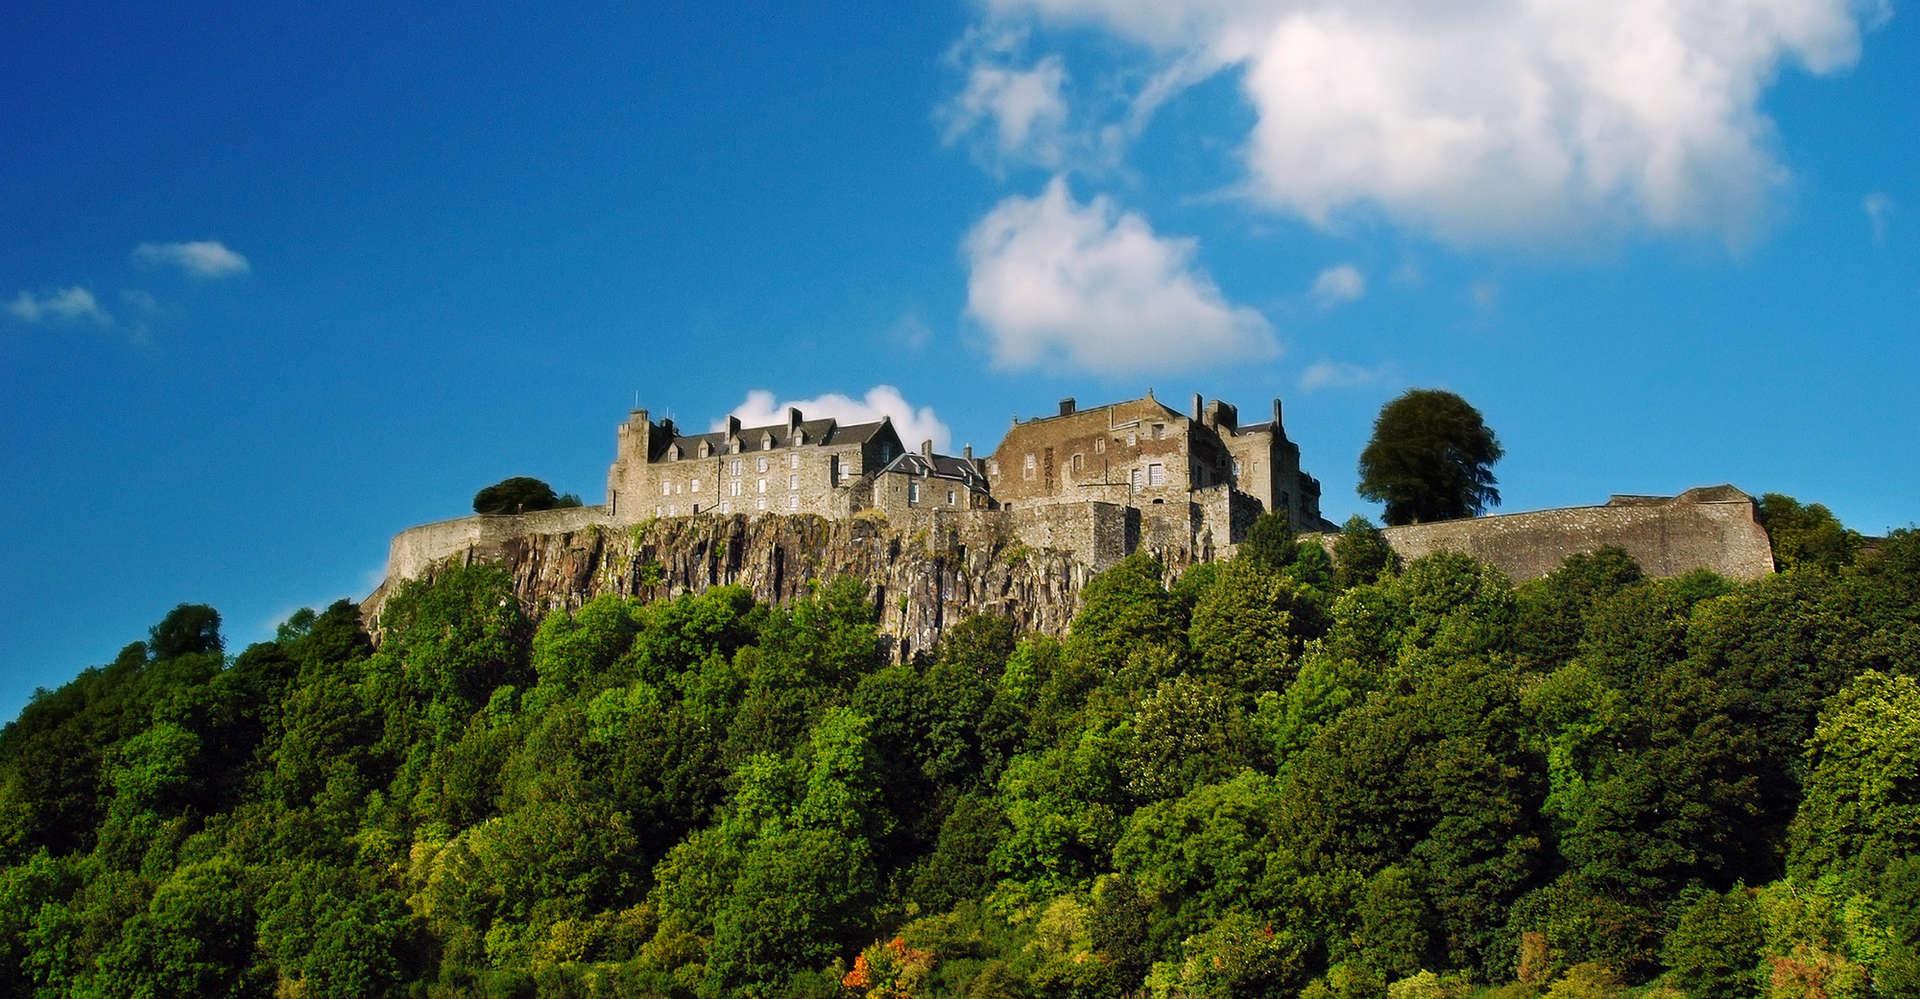 private tour of stirling castle in scotland